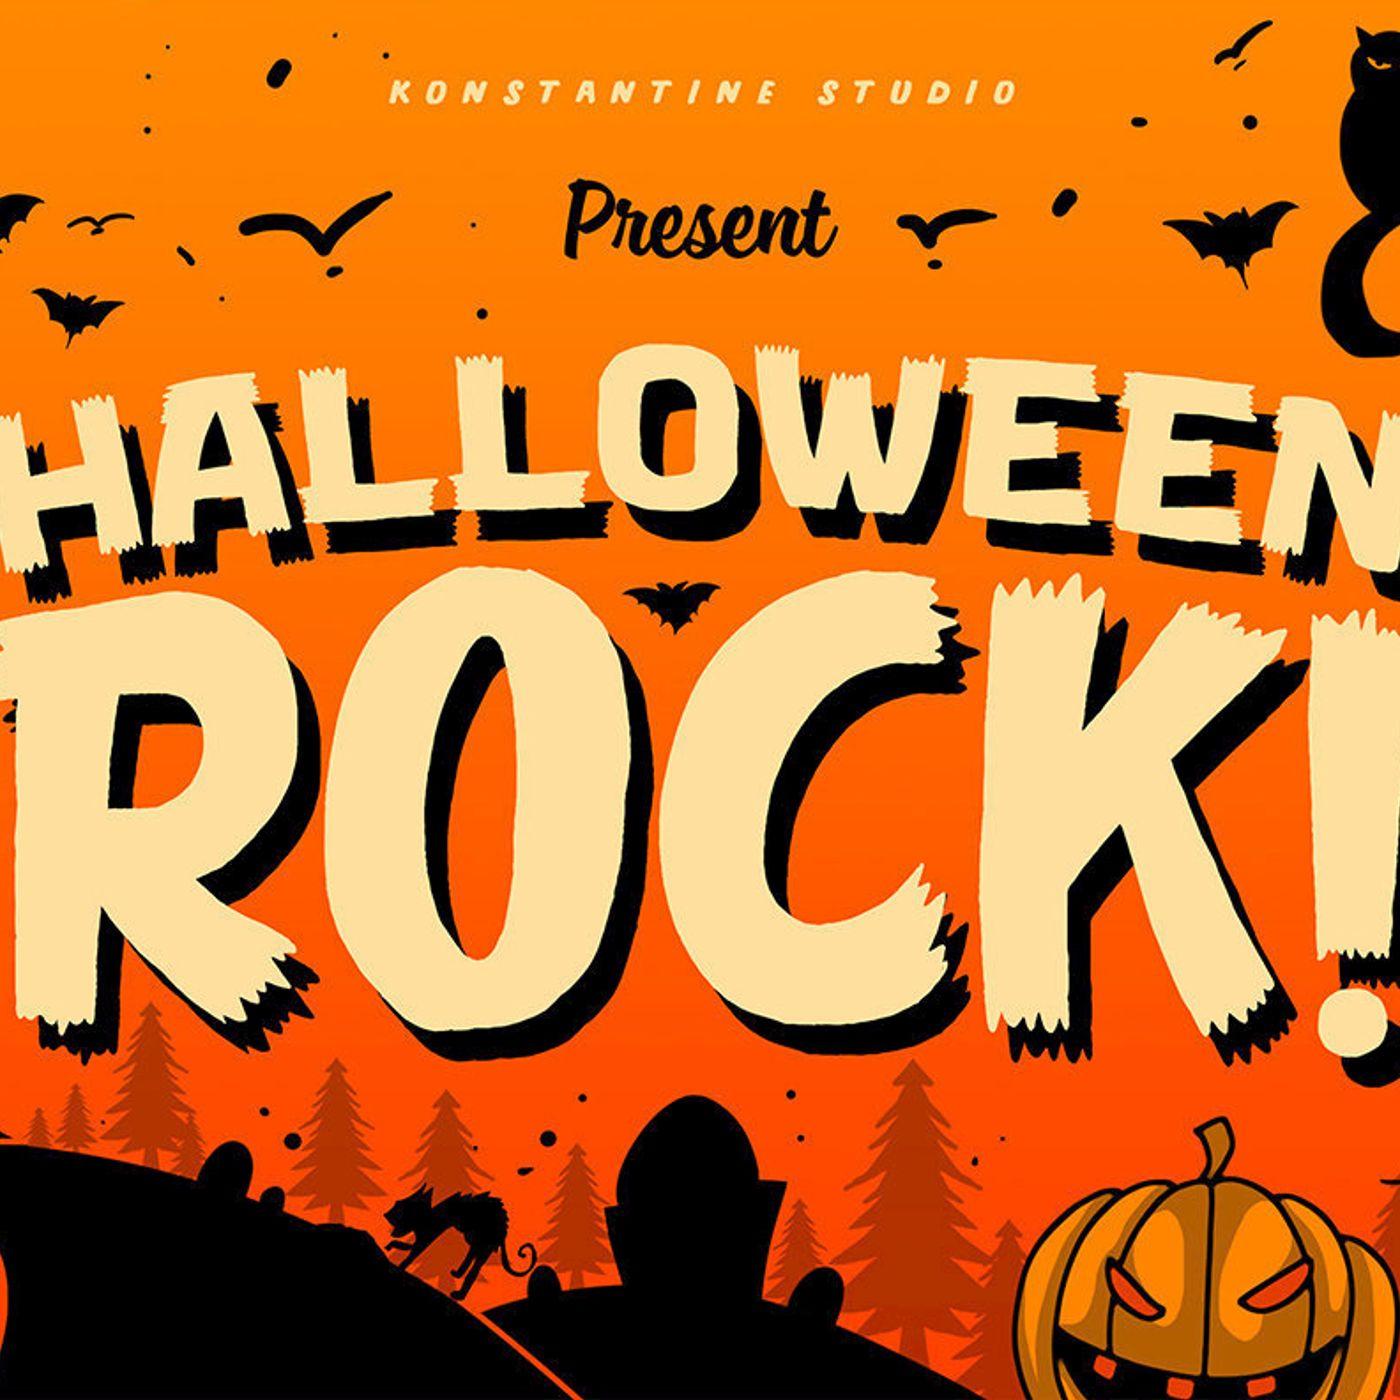 BEST OF CLASSIC ROCK #semanaHalloween #Halloween #avengers #shadowsfx #venom2 #venom #shangchi #whatif #eternals #scream